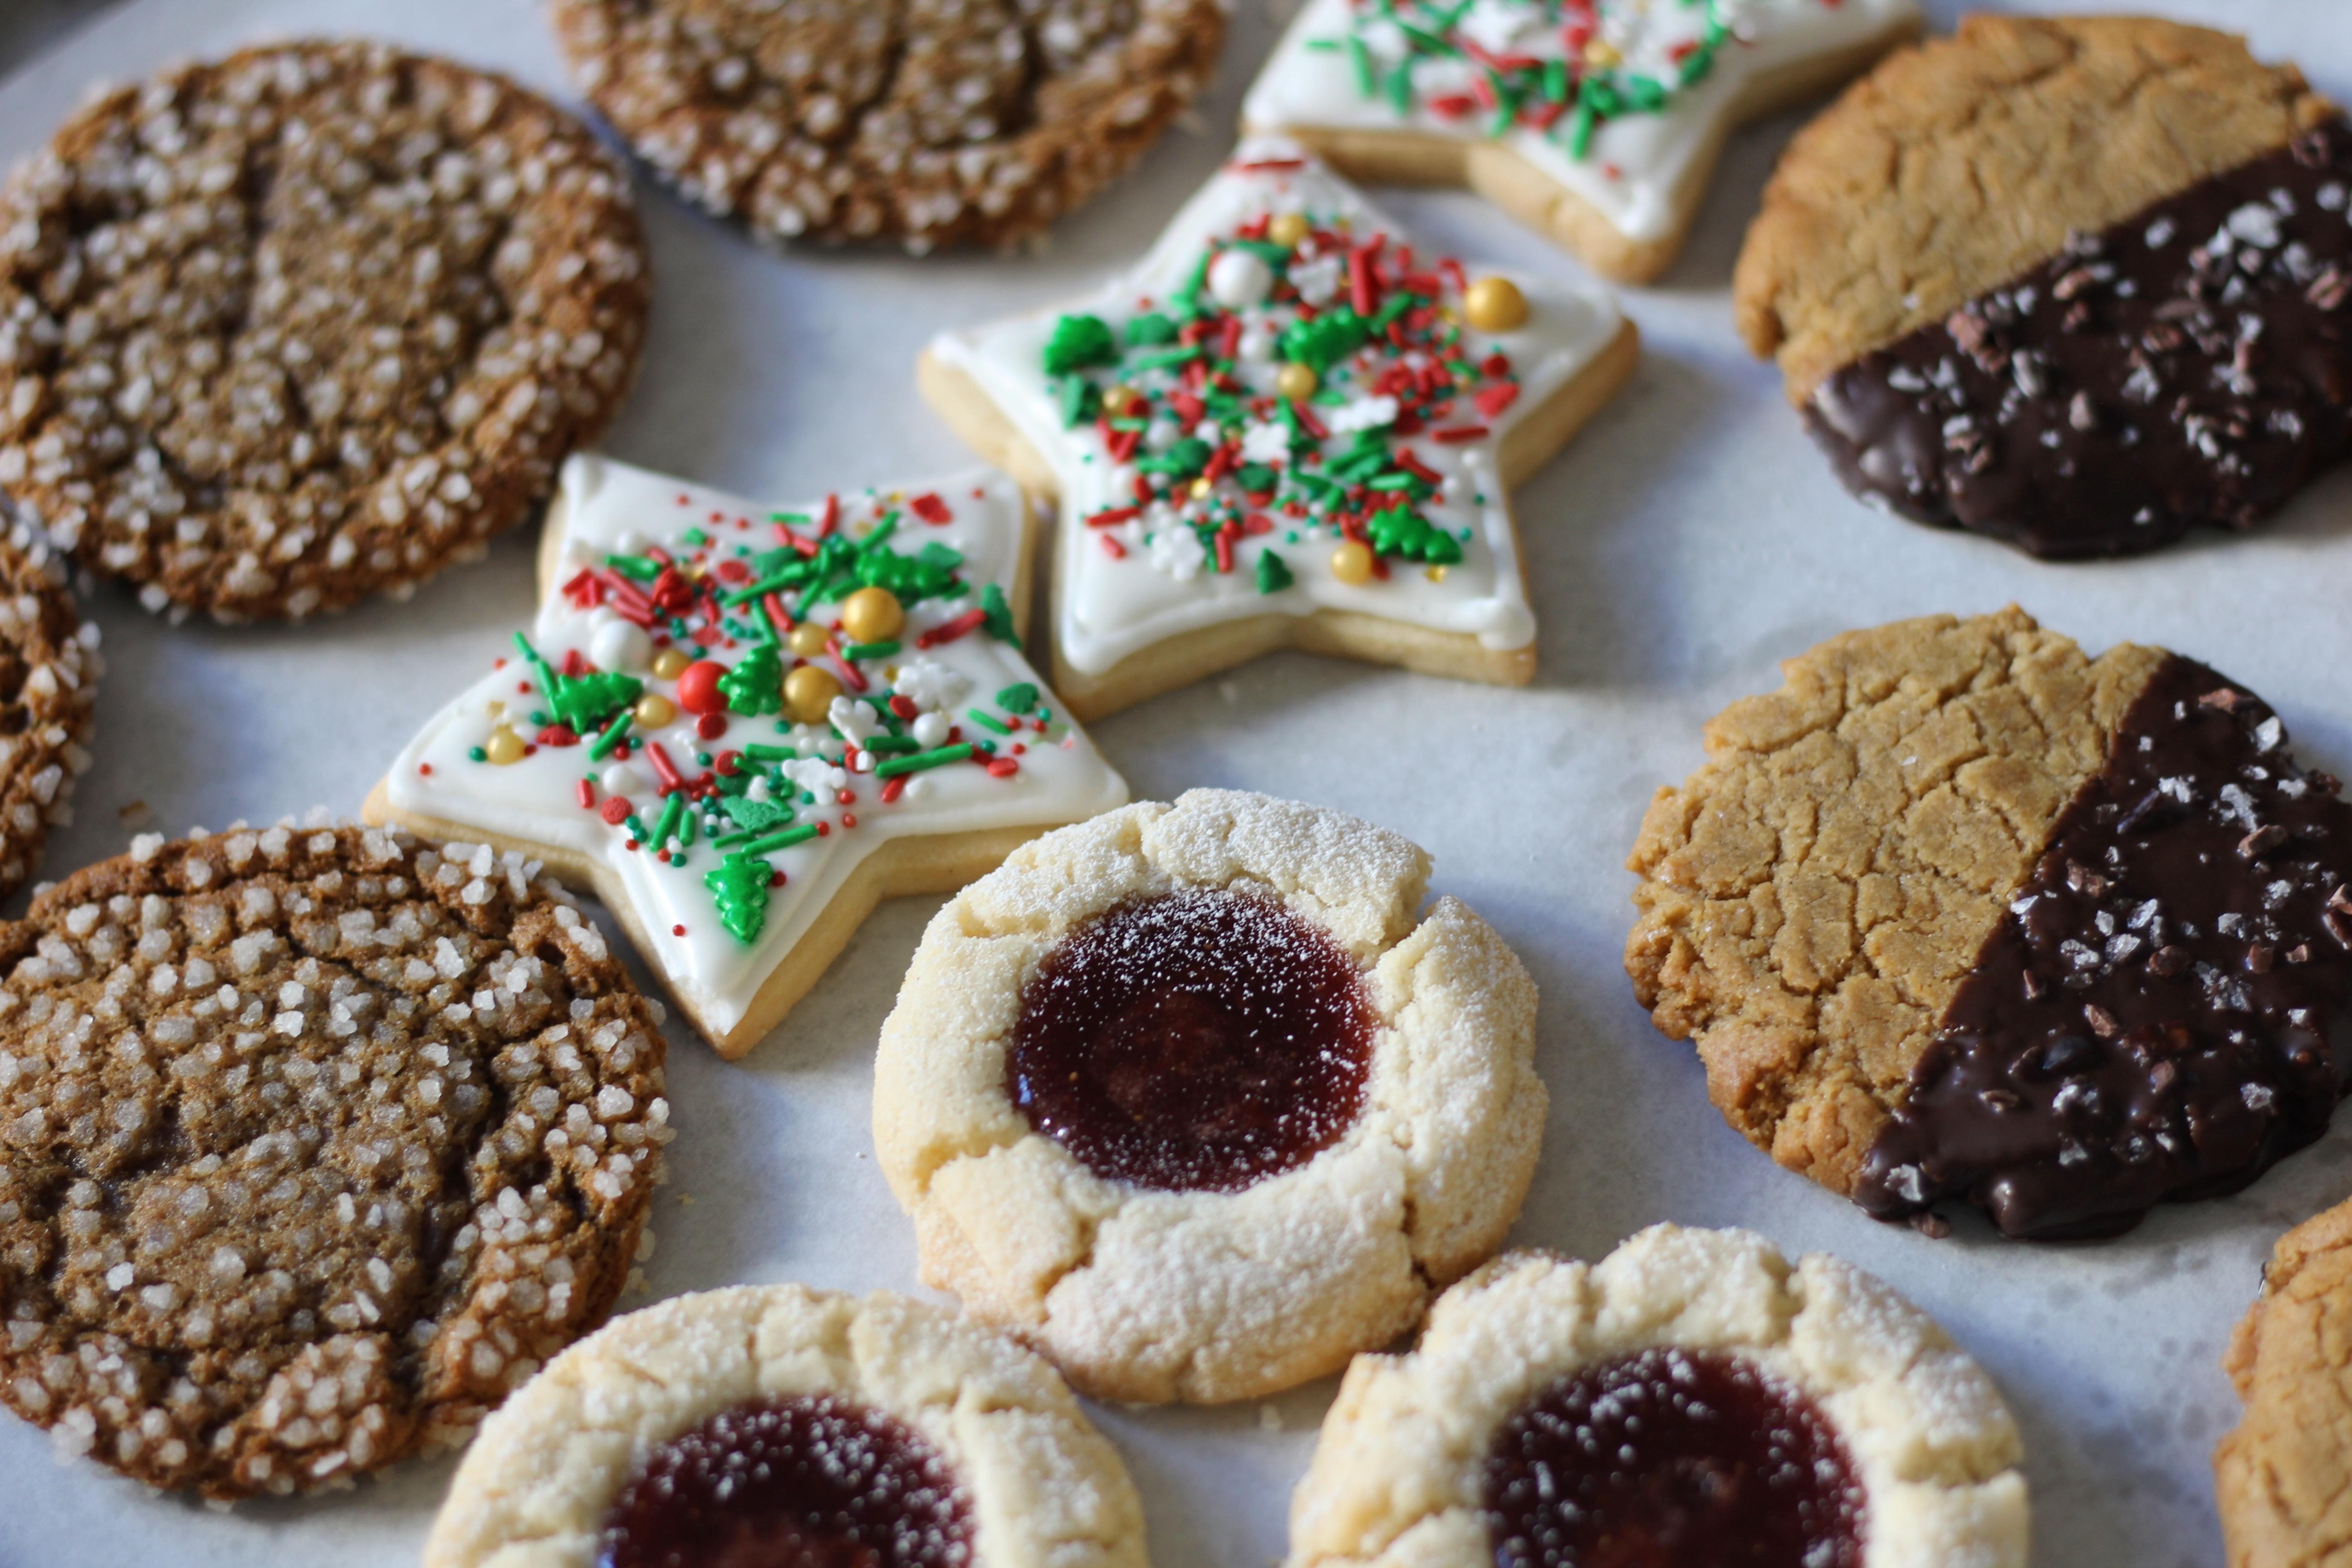 Holiday cookies from Mañana